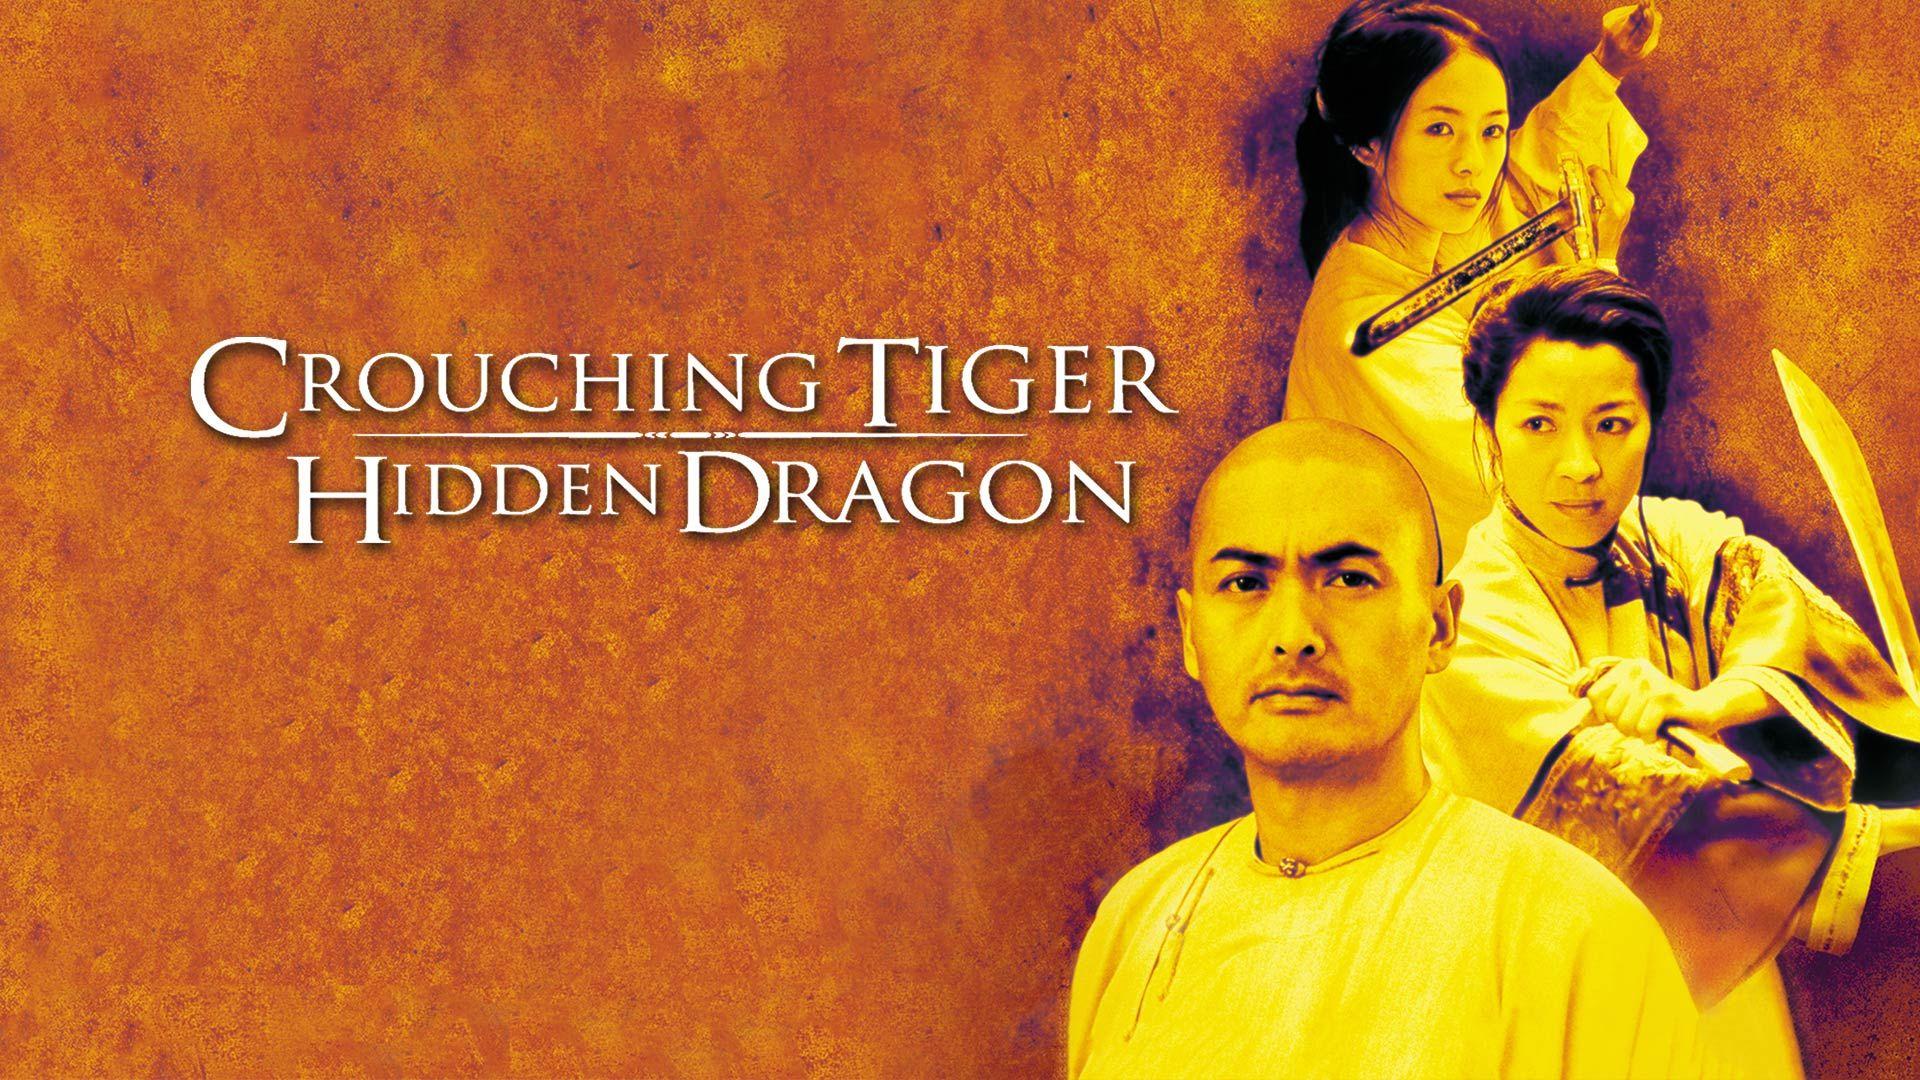 Crouching Tiger, Hidden Dragon (4K UHD)